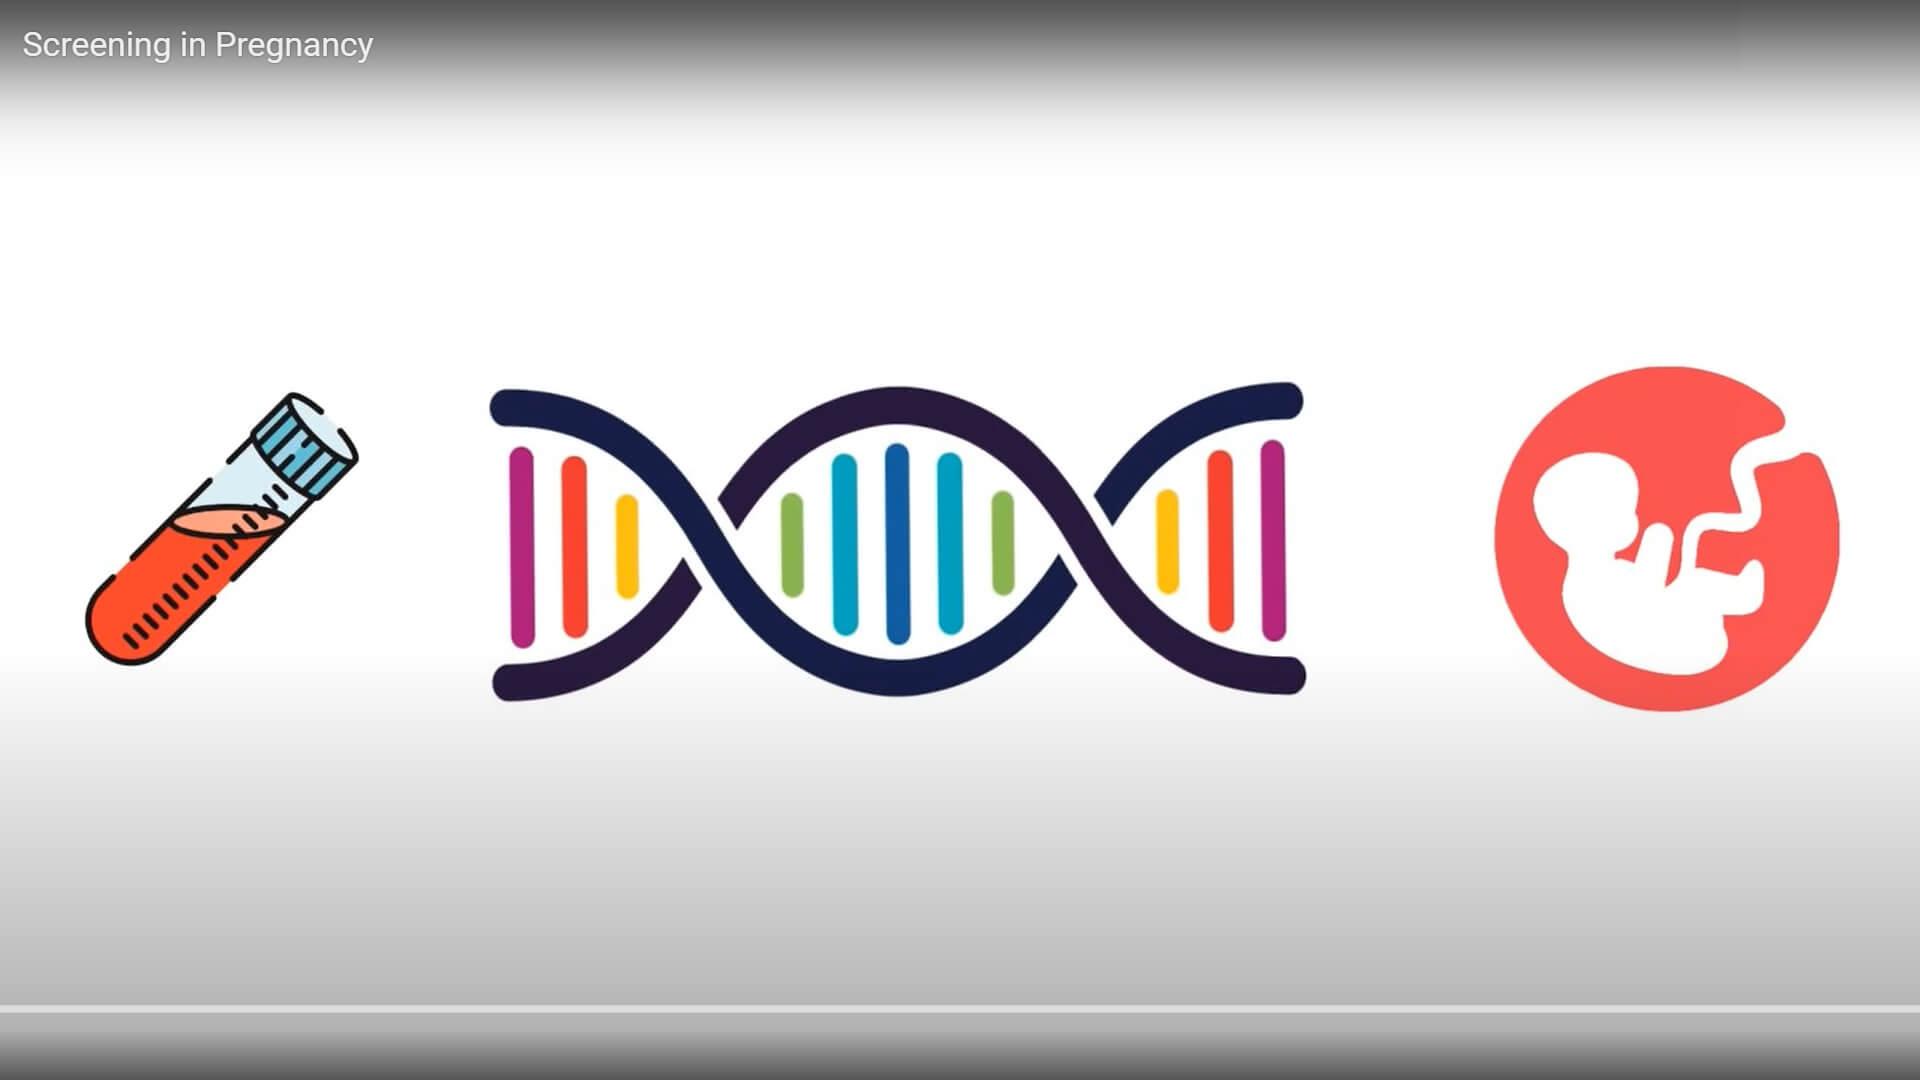 CellsGenetics-SequenomLab-PrenatalniTestove-YuppieEdu2